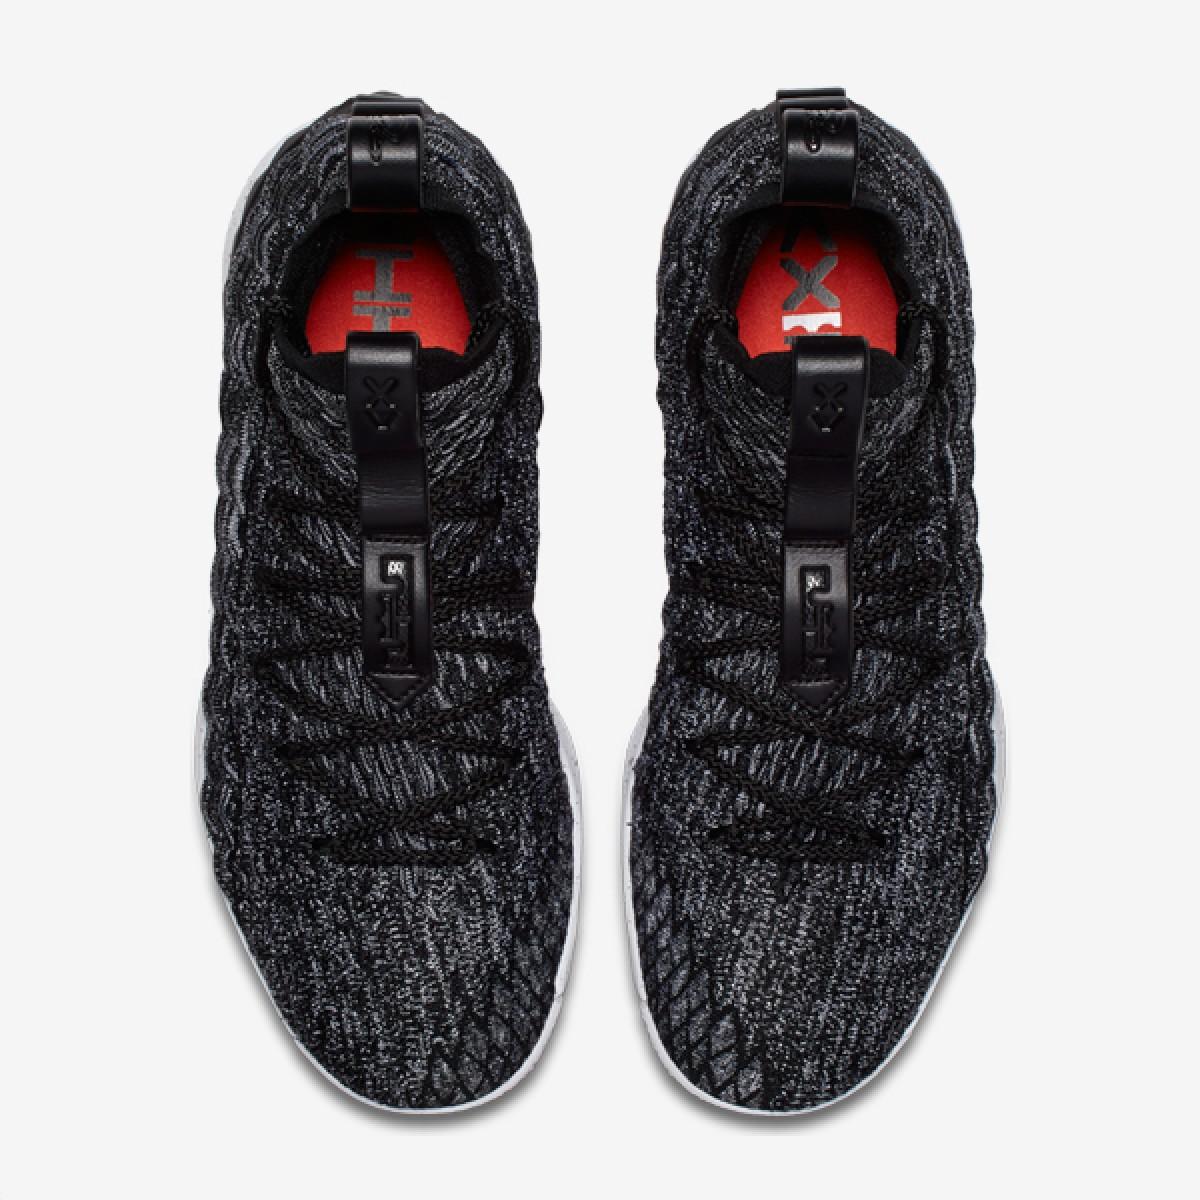 reputable site 567a8 0b20d Nike Lebron XV  Ashes  897648-002